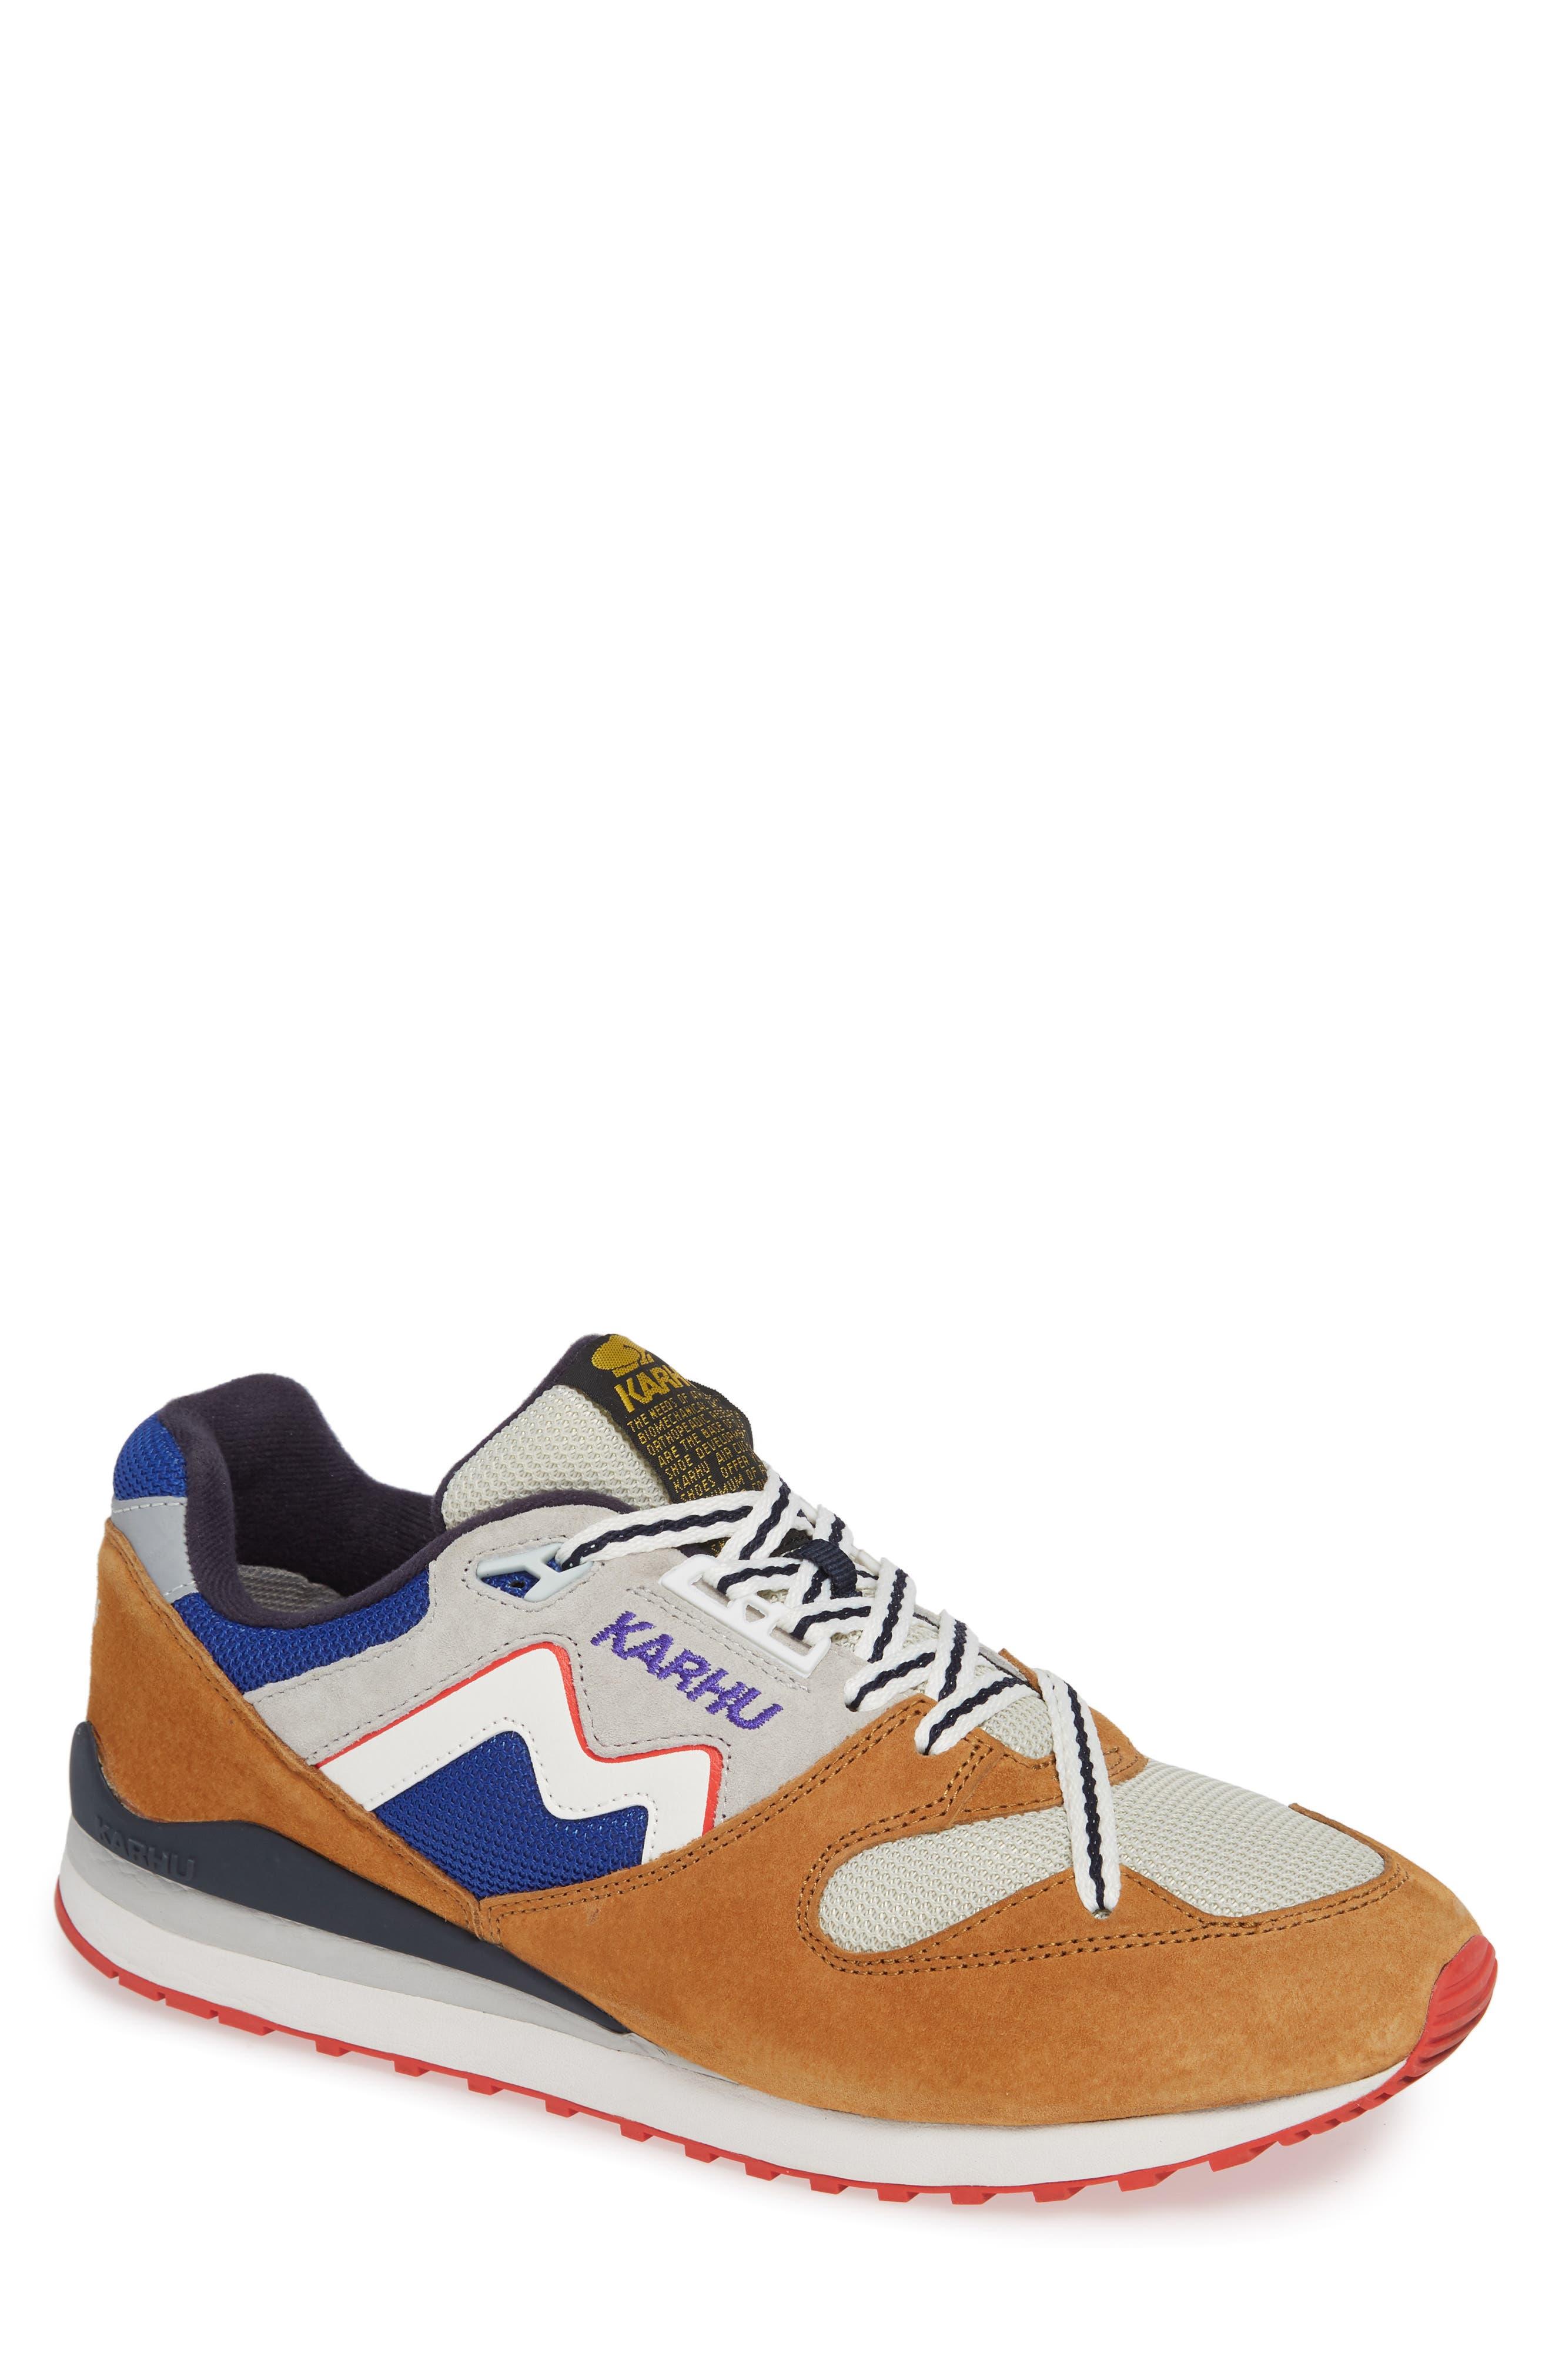 Synchron Classic Sneaker,                             Main thumbnail 1, color,                             OG GREY